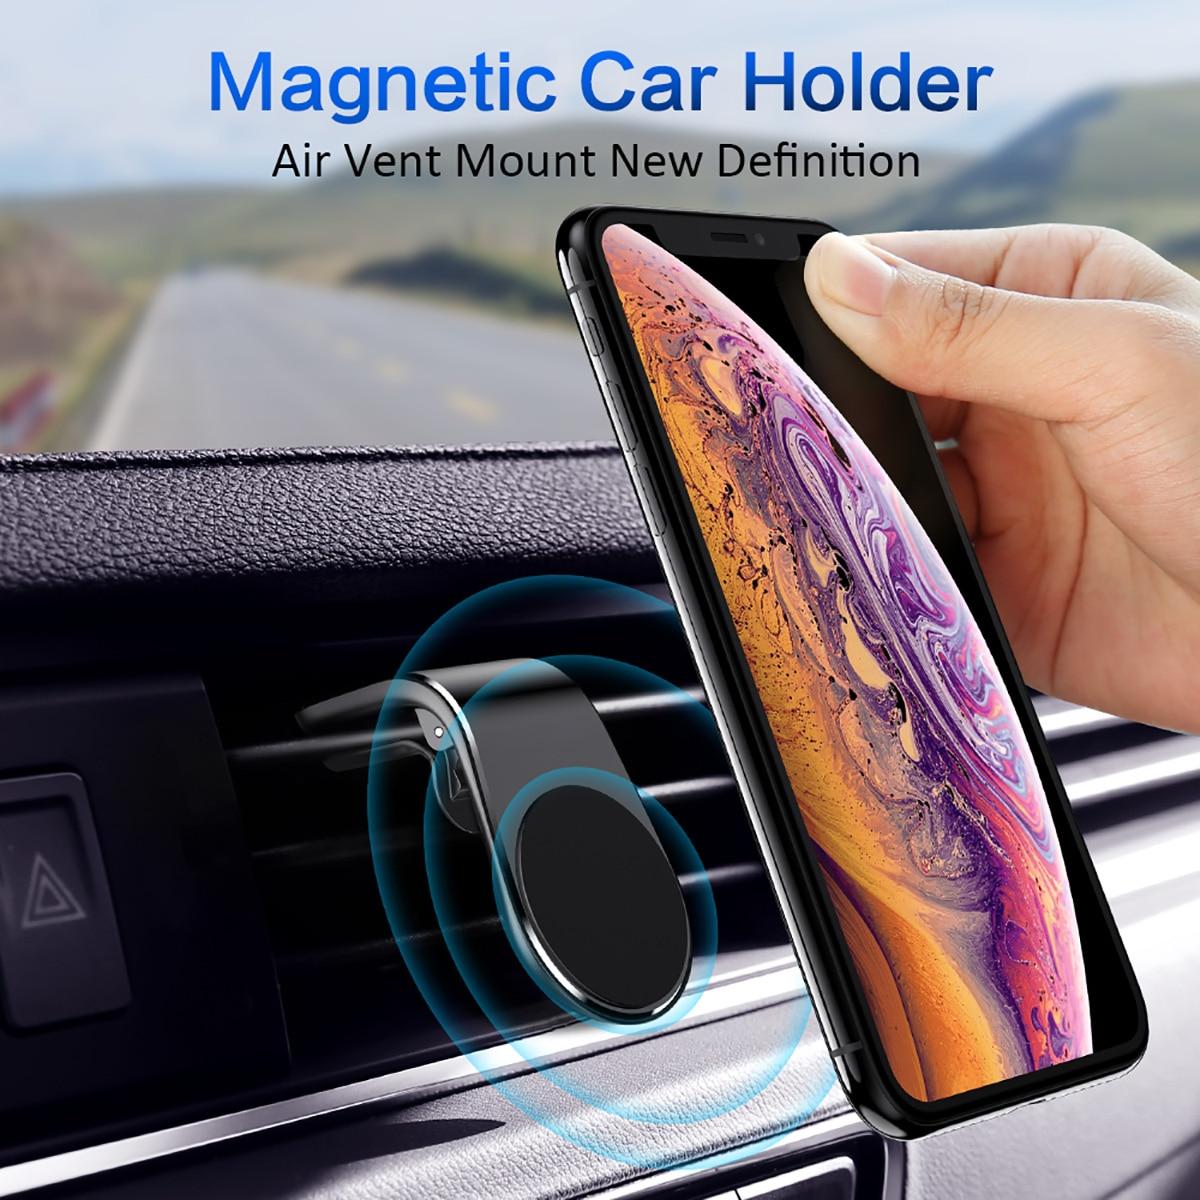 HTB17aE2X8Cw3KVjSZR0q6zcUpXa8 - Minimalist Magnetic Car Phone Holder